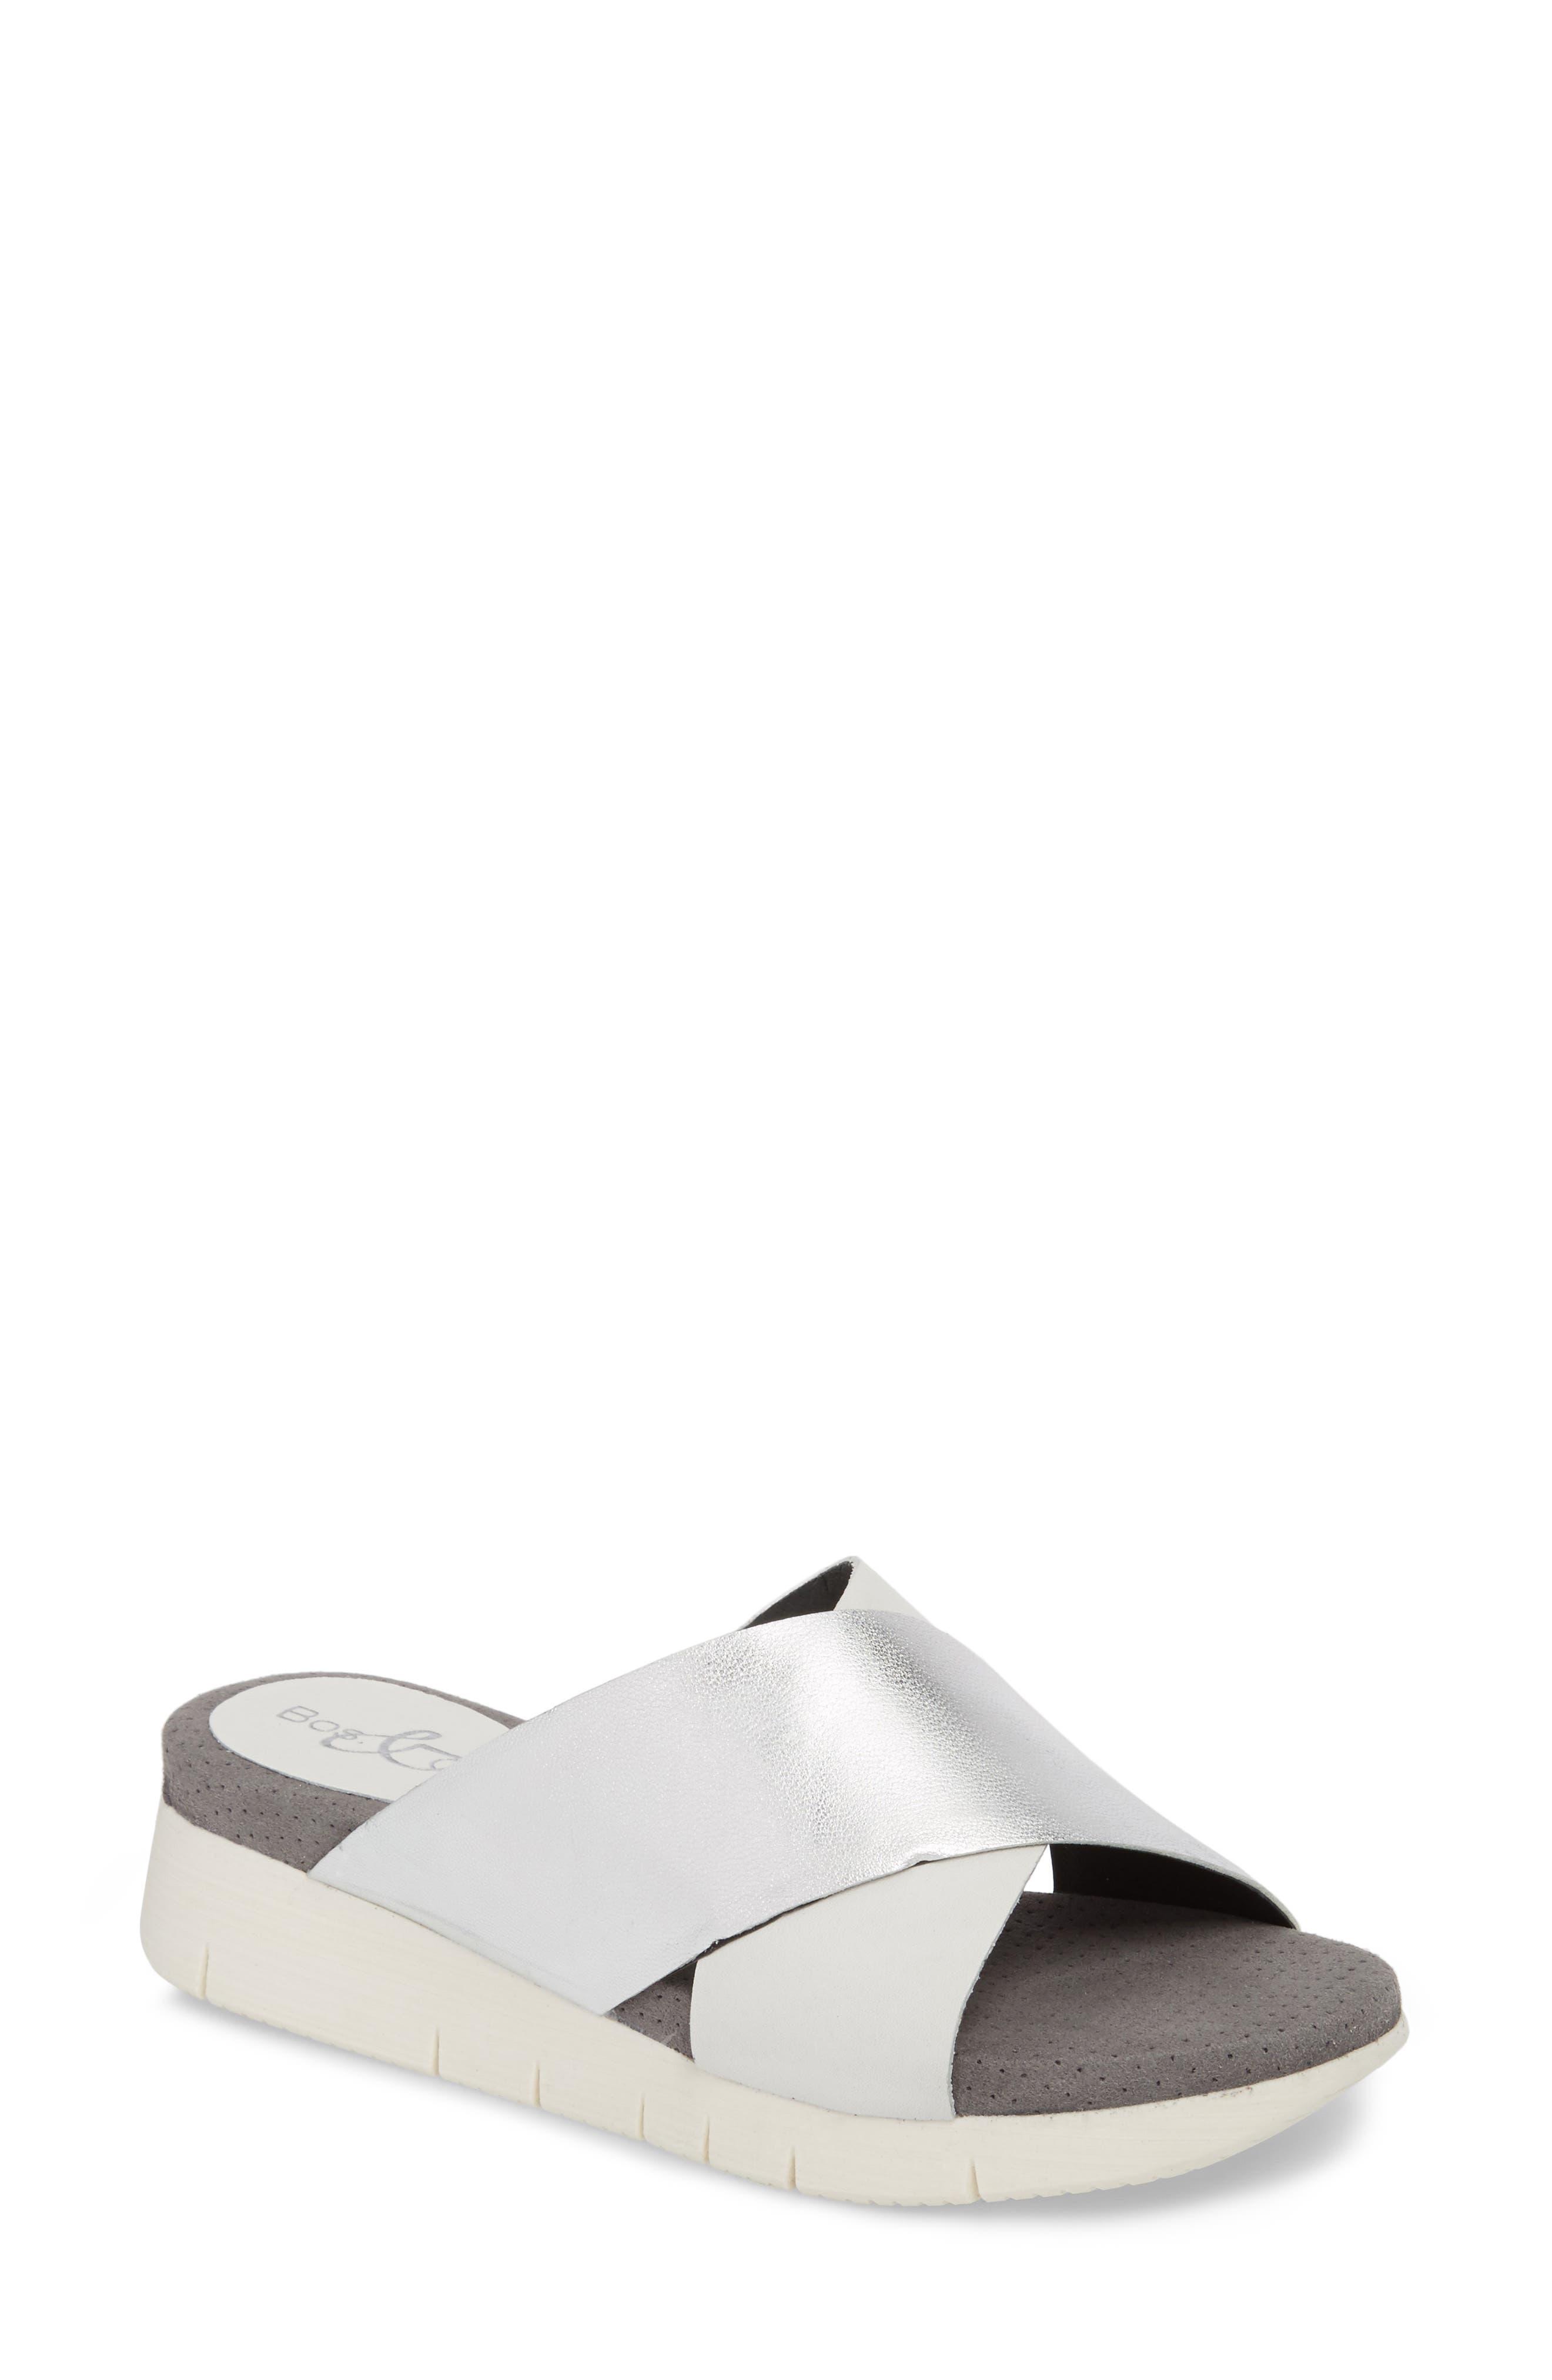 Piney Slide Sandal,                             Main thumbnail 1, color,                             White/ Silver Leather